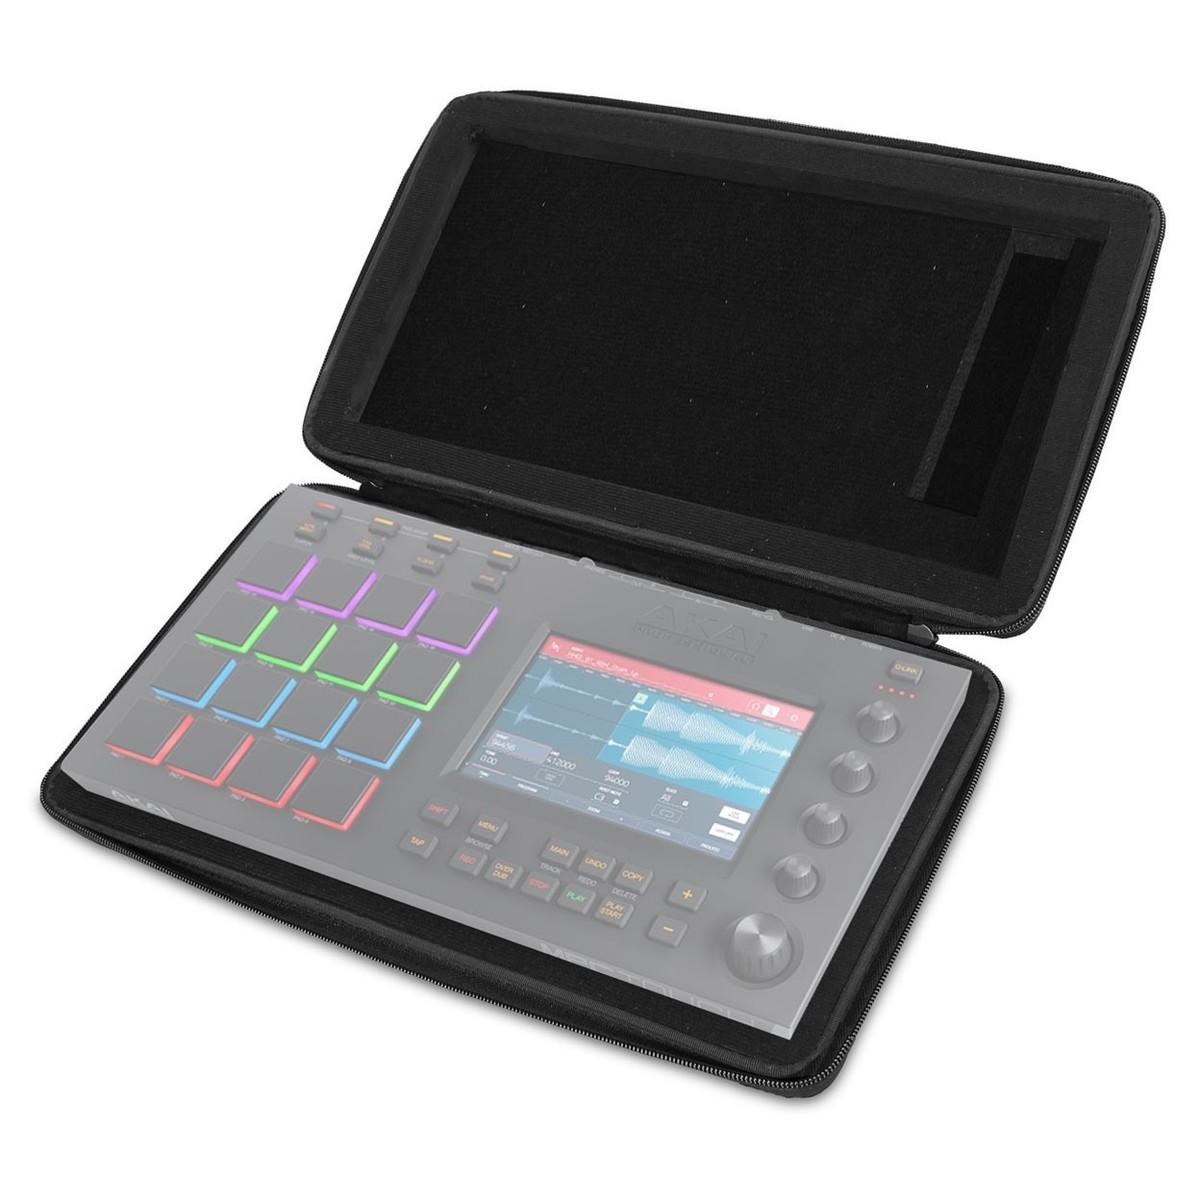 DISC UDG Creator Akai MPC Touch Hardcase